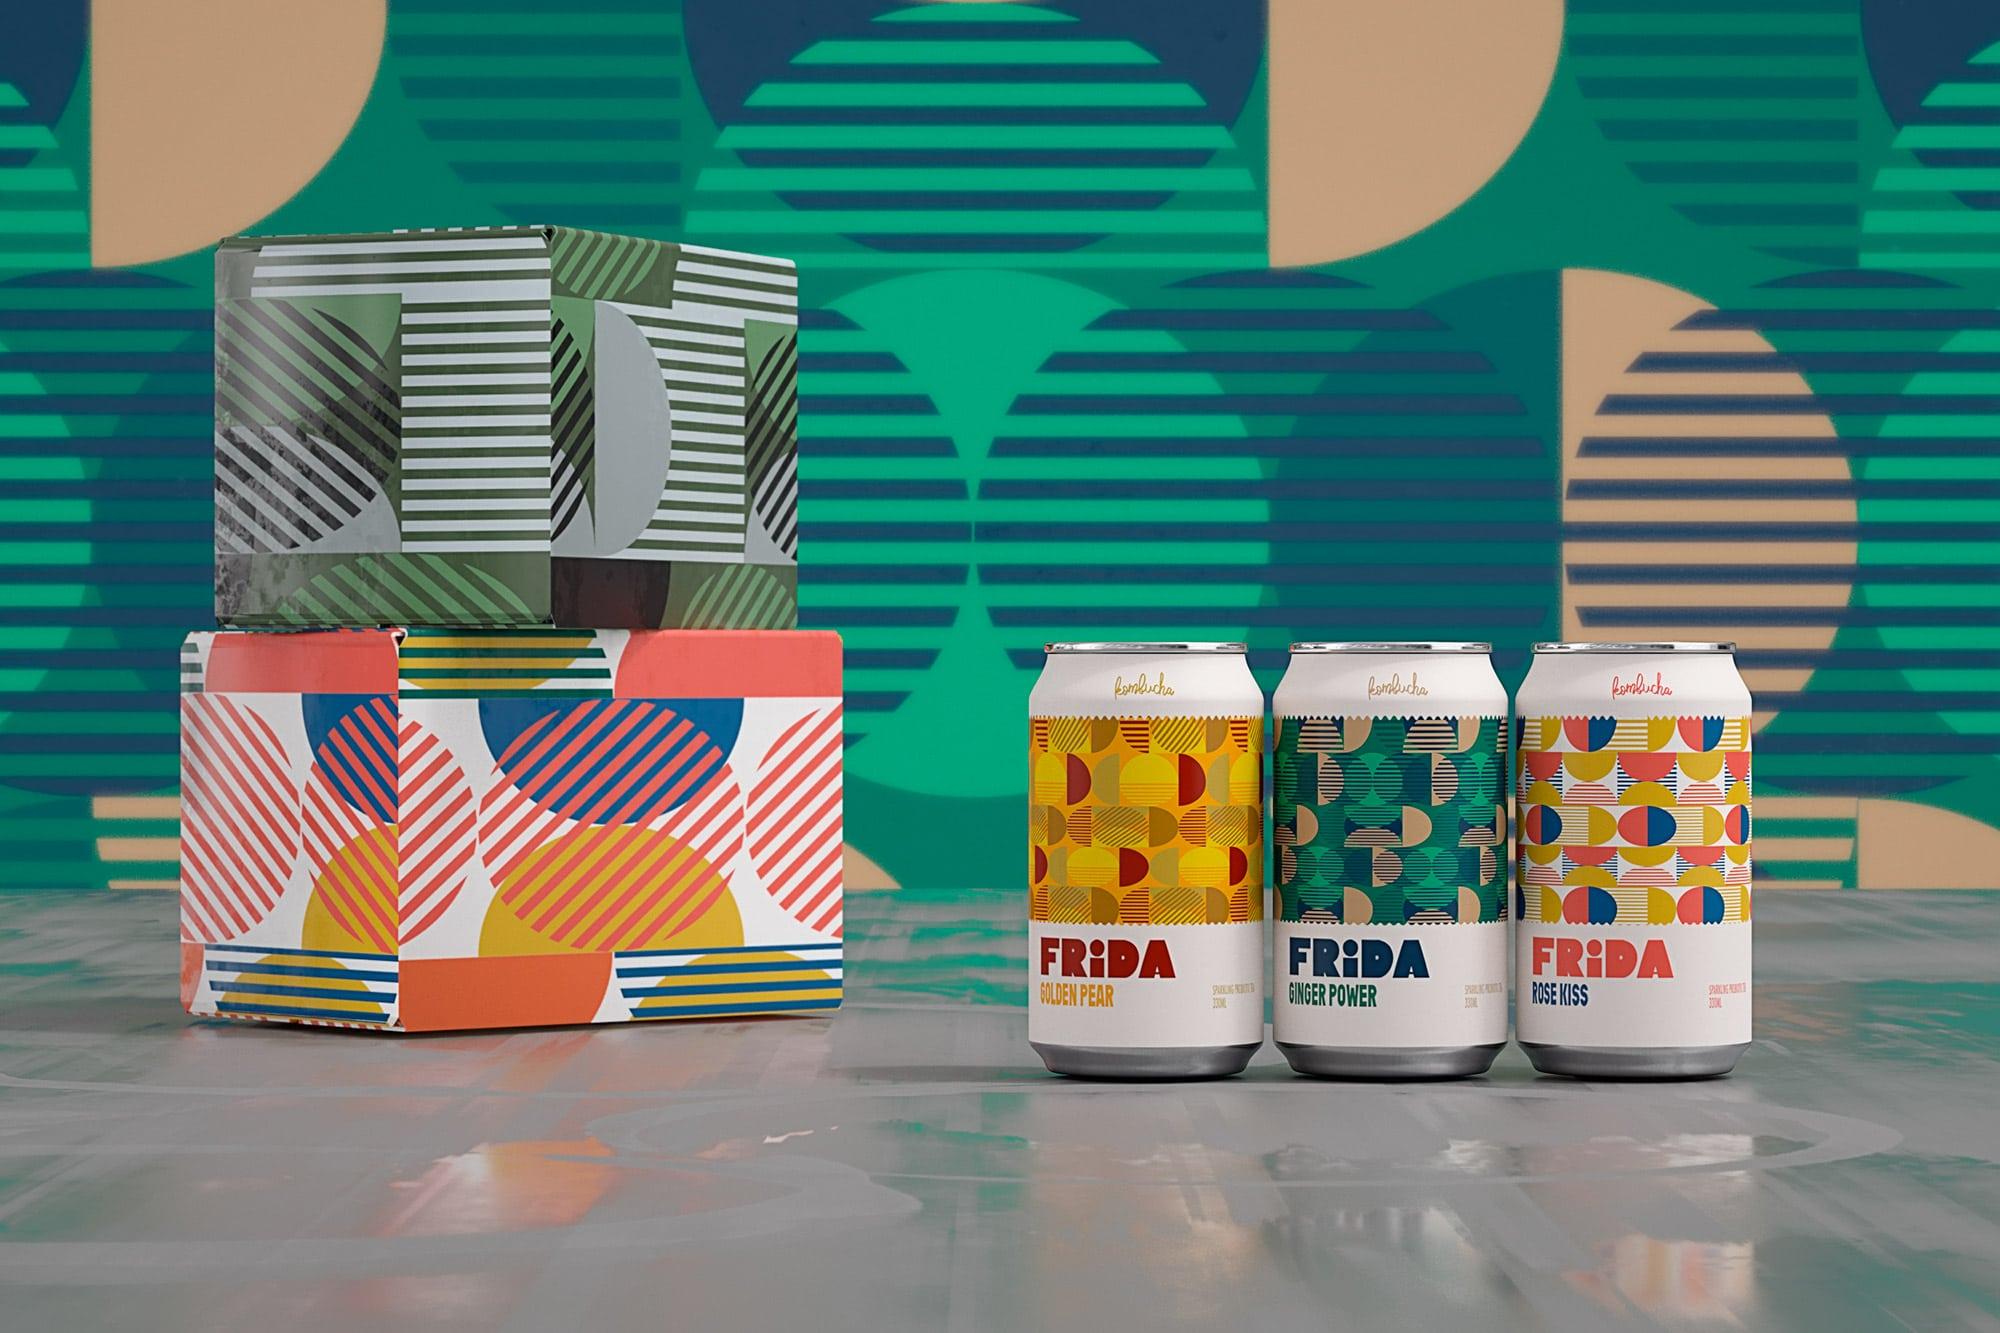 Gamme Frida Kombucha avec cartons.